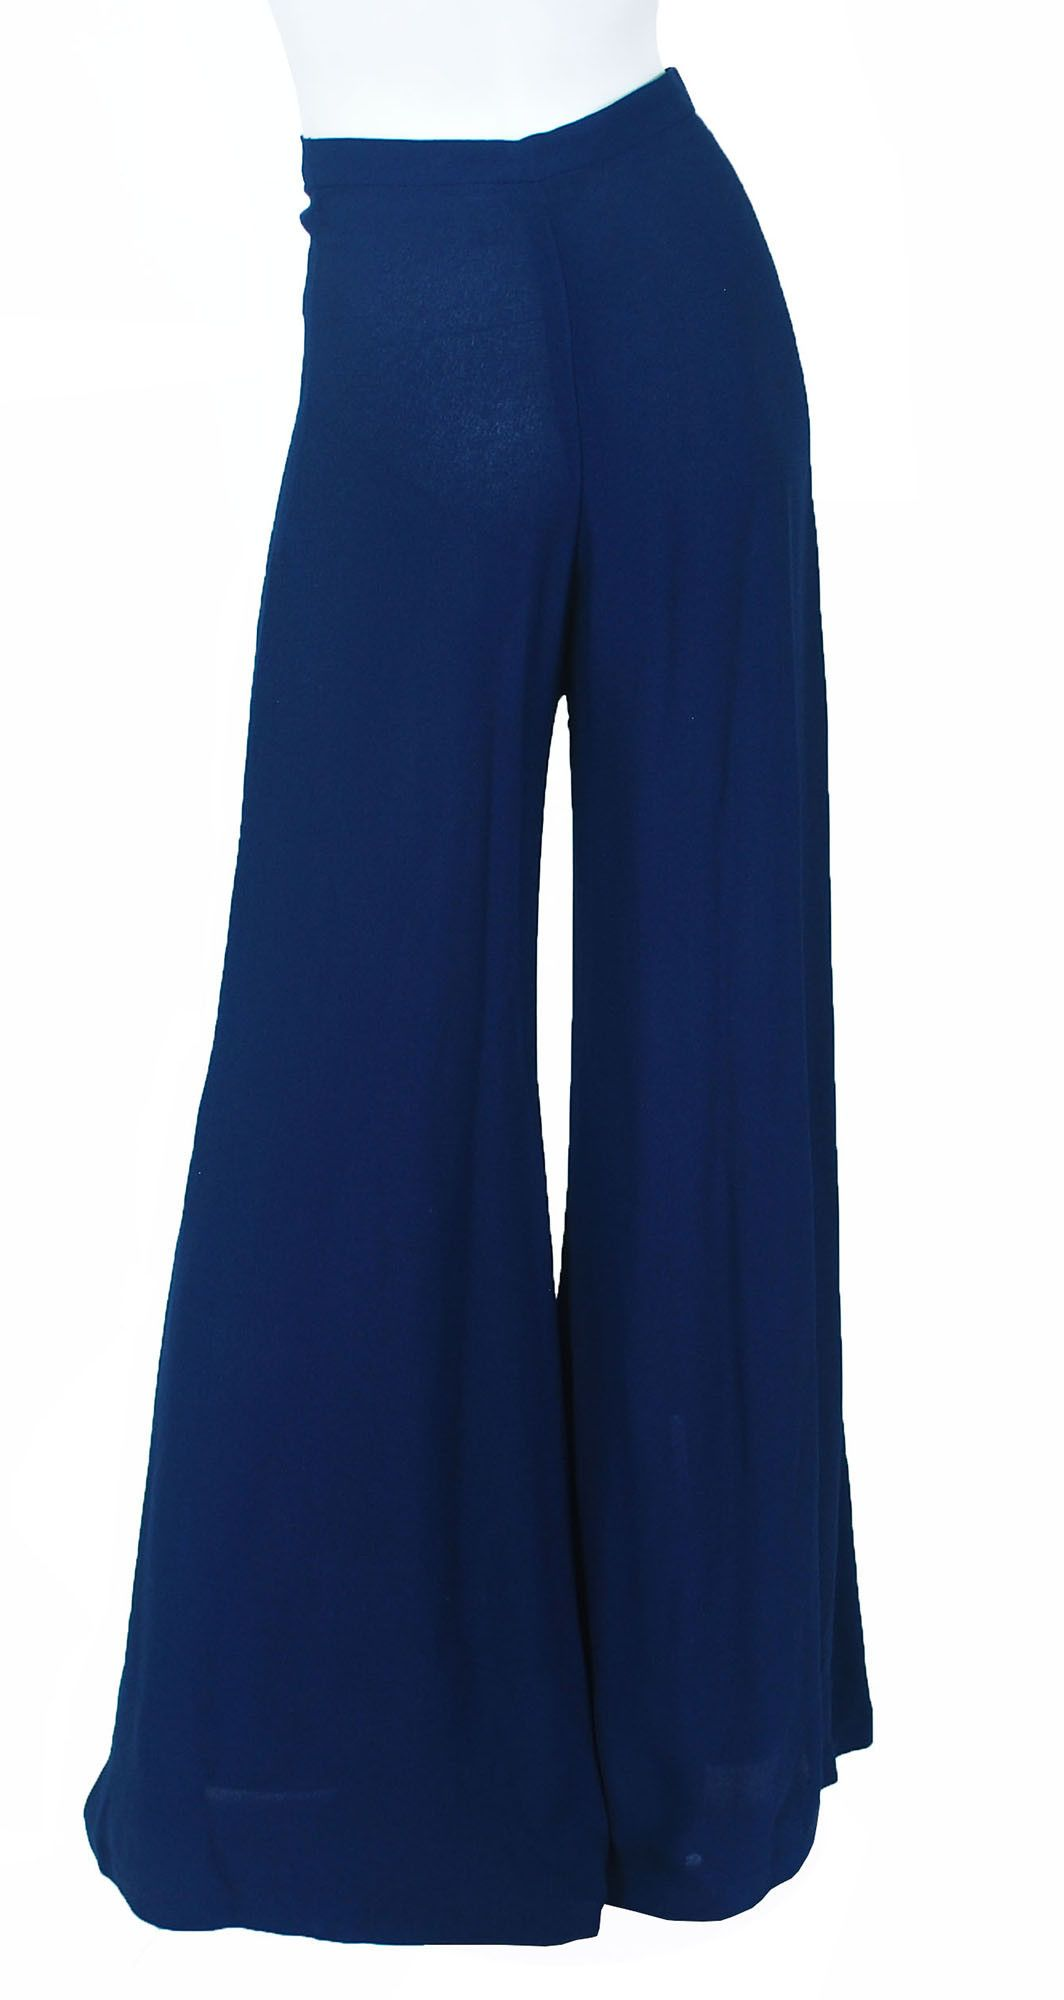 Ossie clark pants